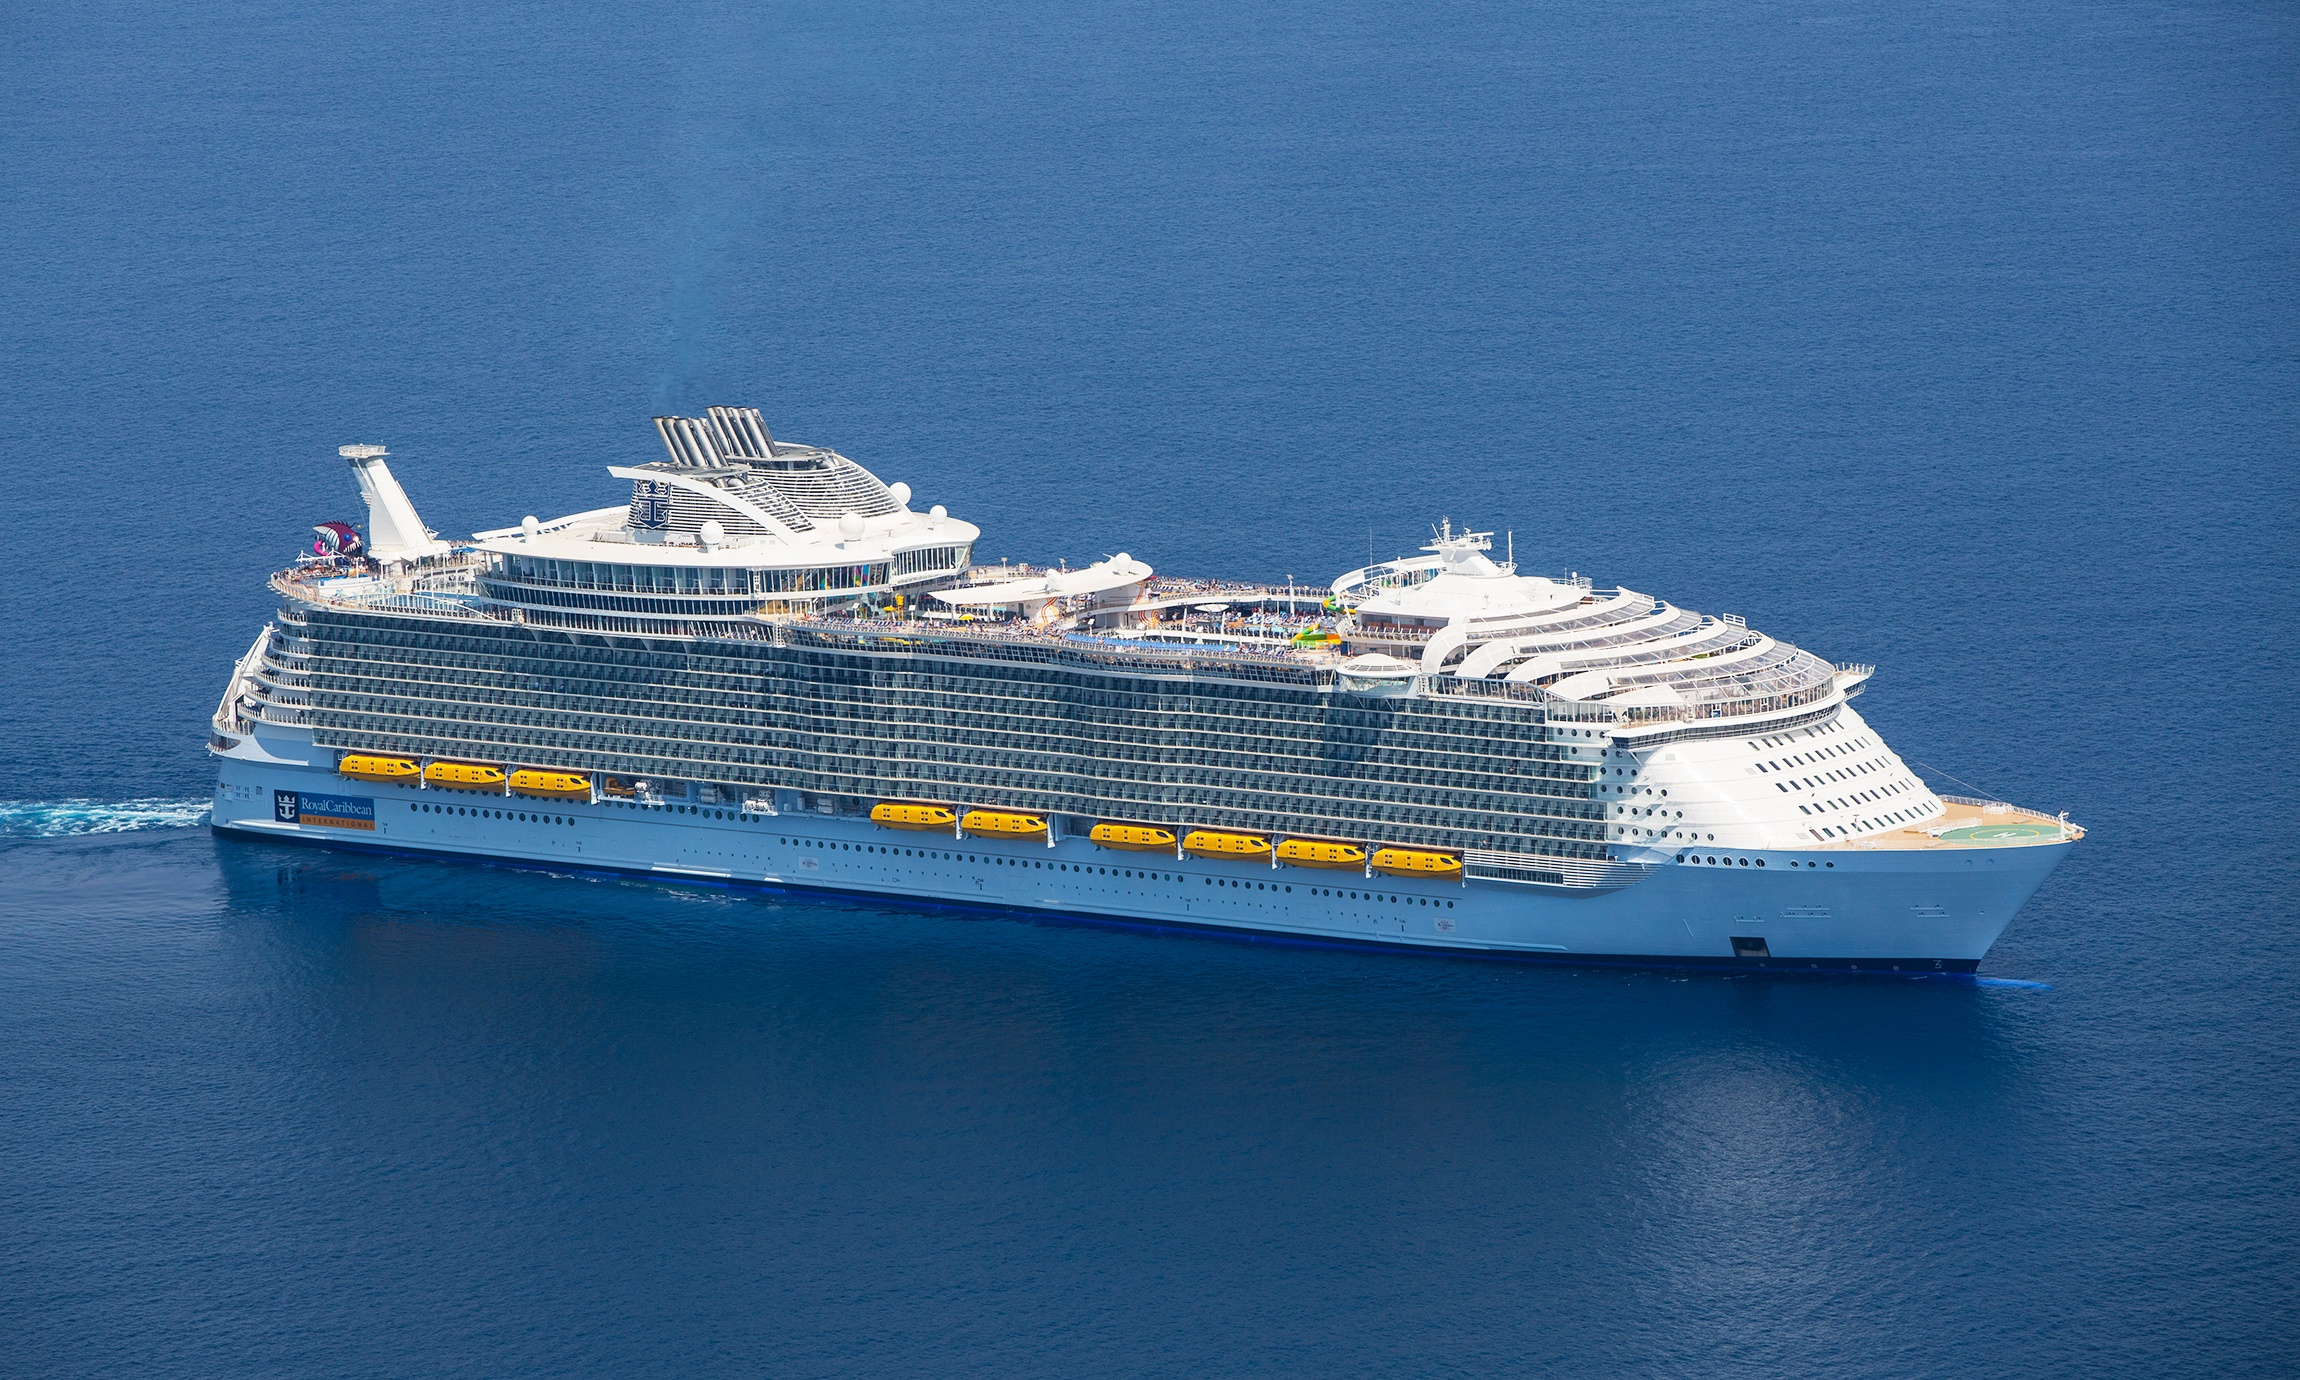 Ms Symphony Of The Seas Royal Caribbean